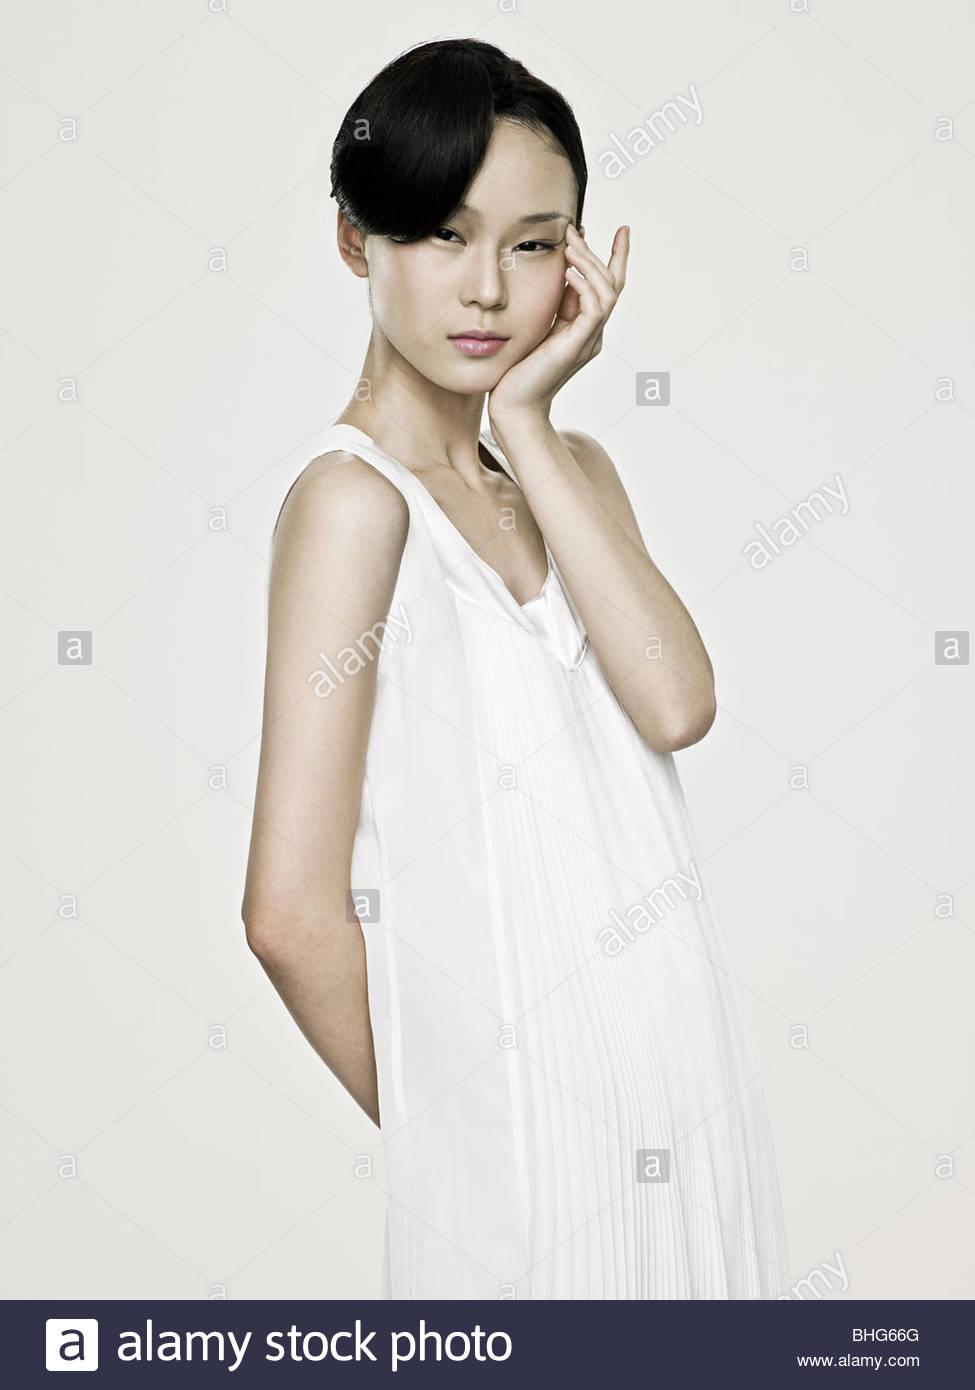 Joven mujer asiática tocando su ojo Imagen De Stock